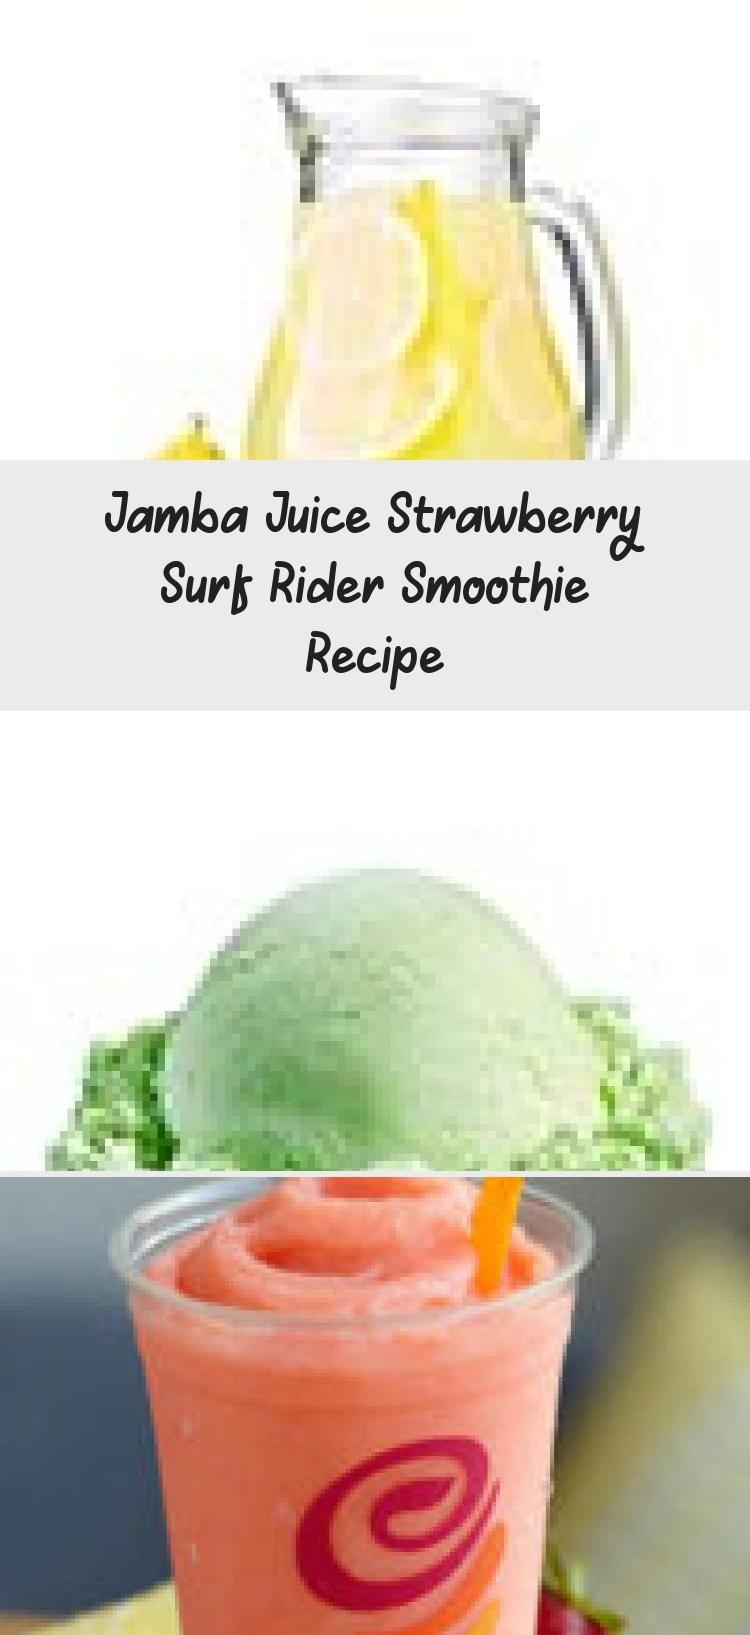 Jamba Juice Strawberry Surf Rider Smoothie Recipe Watermelon Smoothies Jamba Juice Smoothies